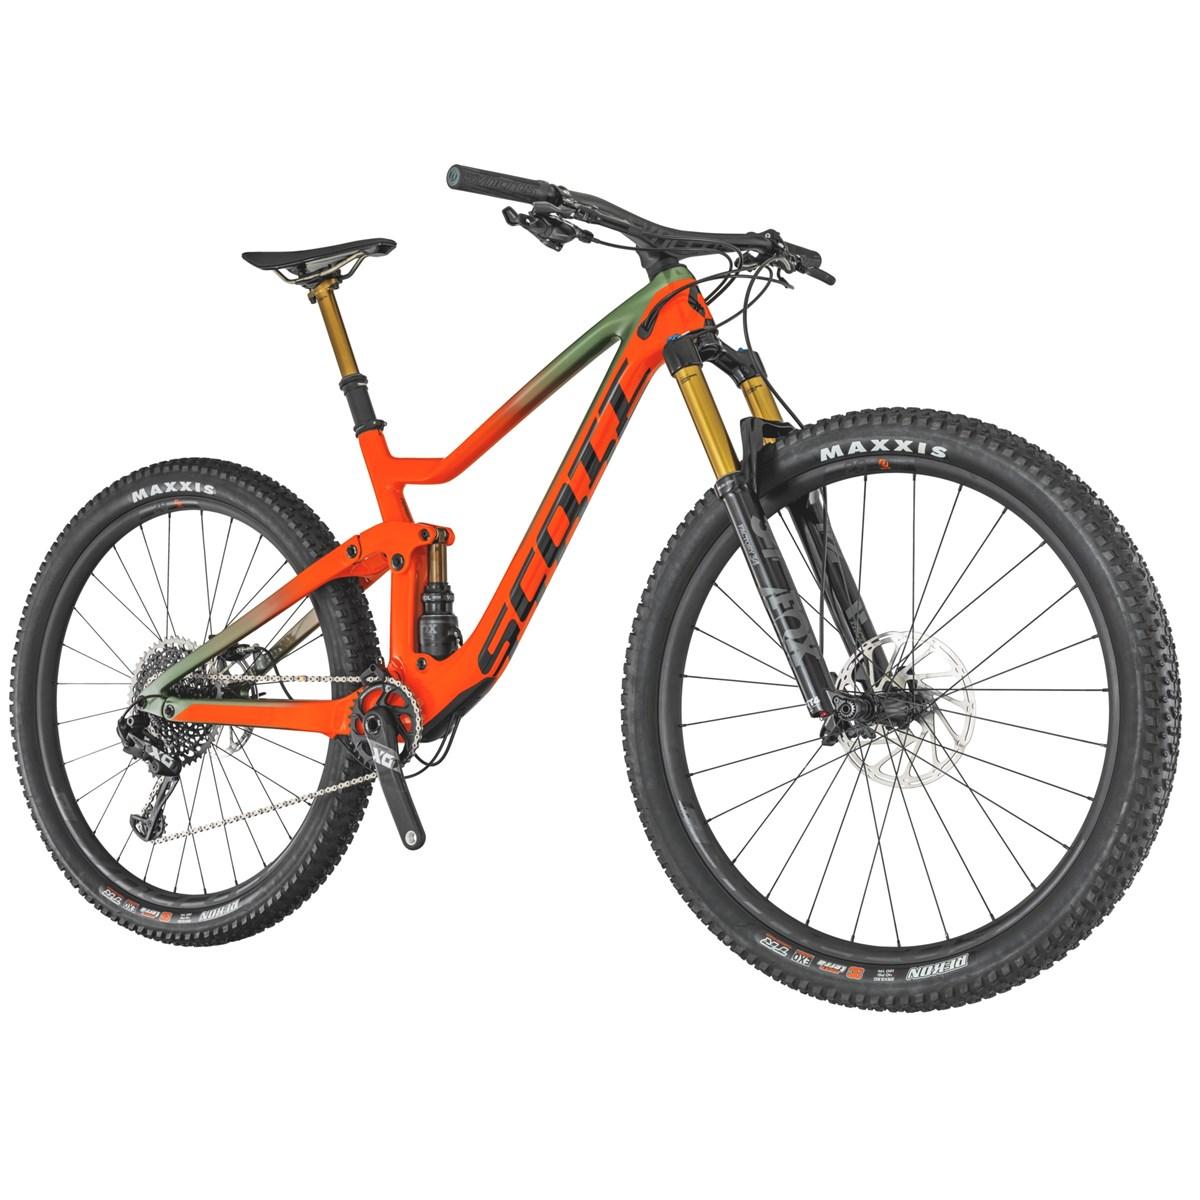 Fair Trading Licence Check >> 2019 Scott Genius 900 Tuned Full Suspension Carbon Mountain Bike £4,949.25